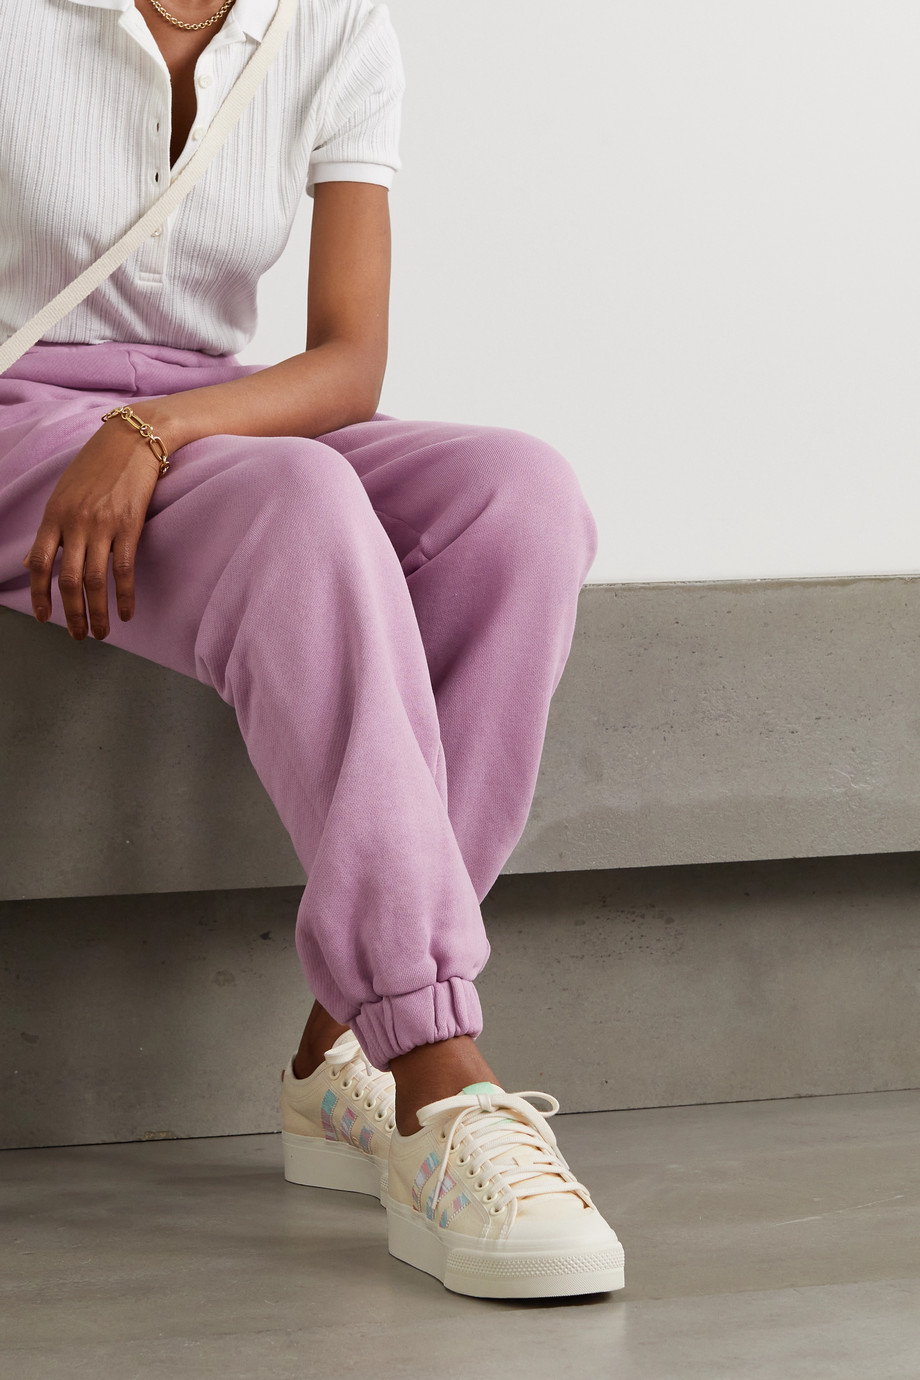 adidas Originals Nizza rubber-trimmed canvas platform sneakers